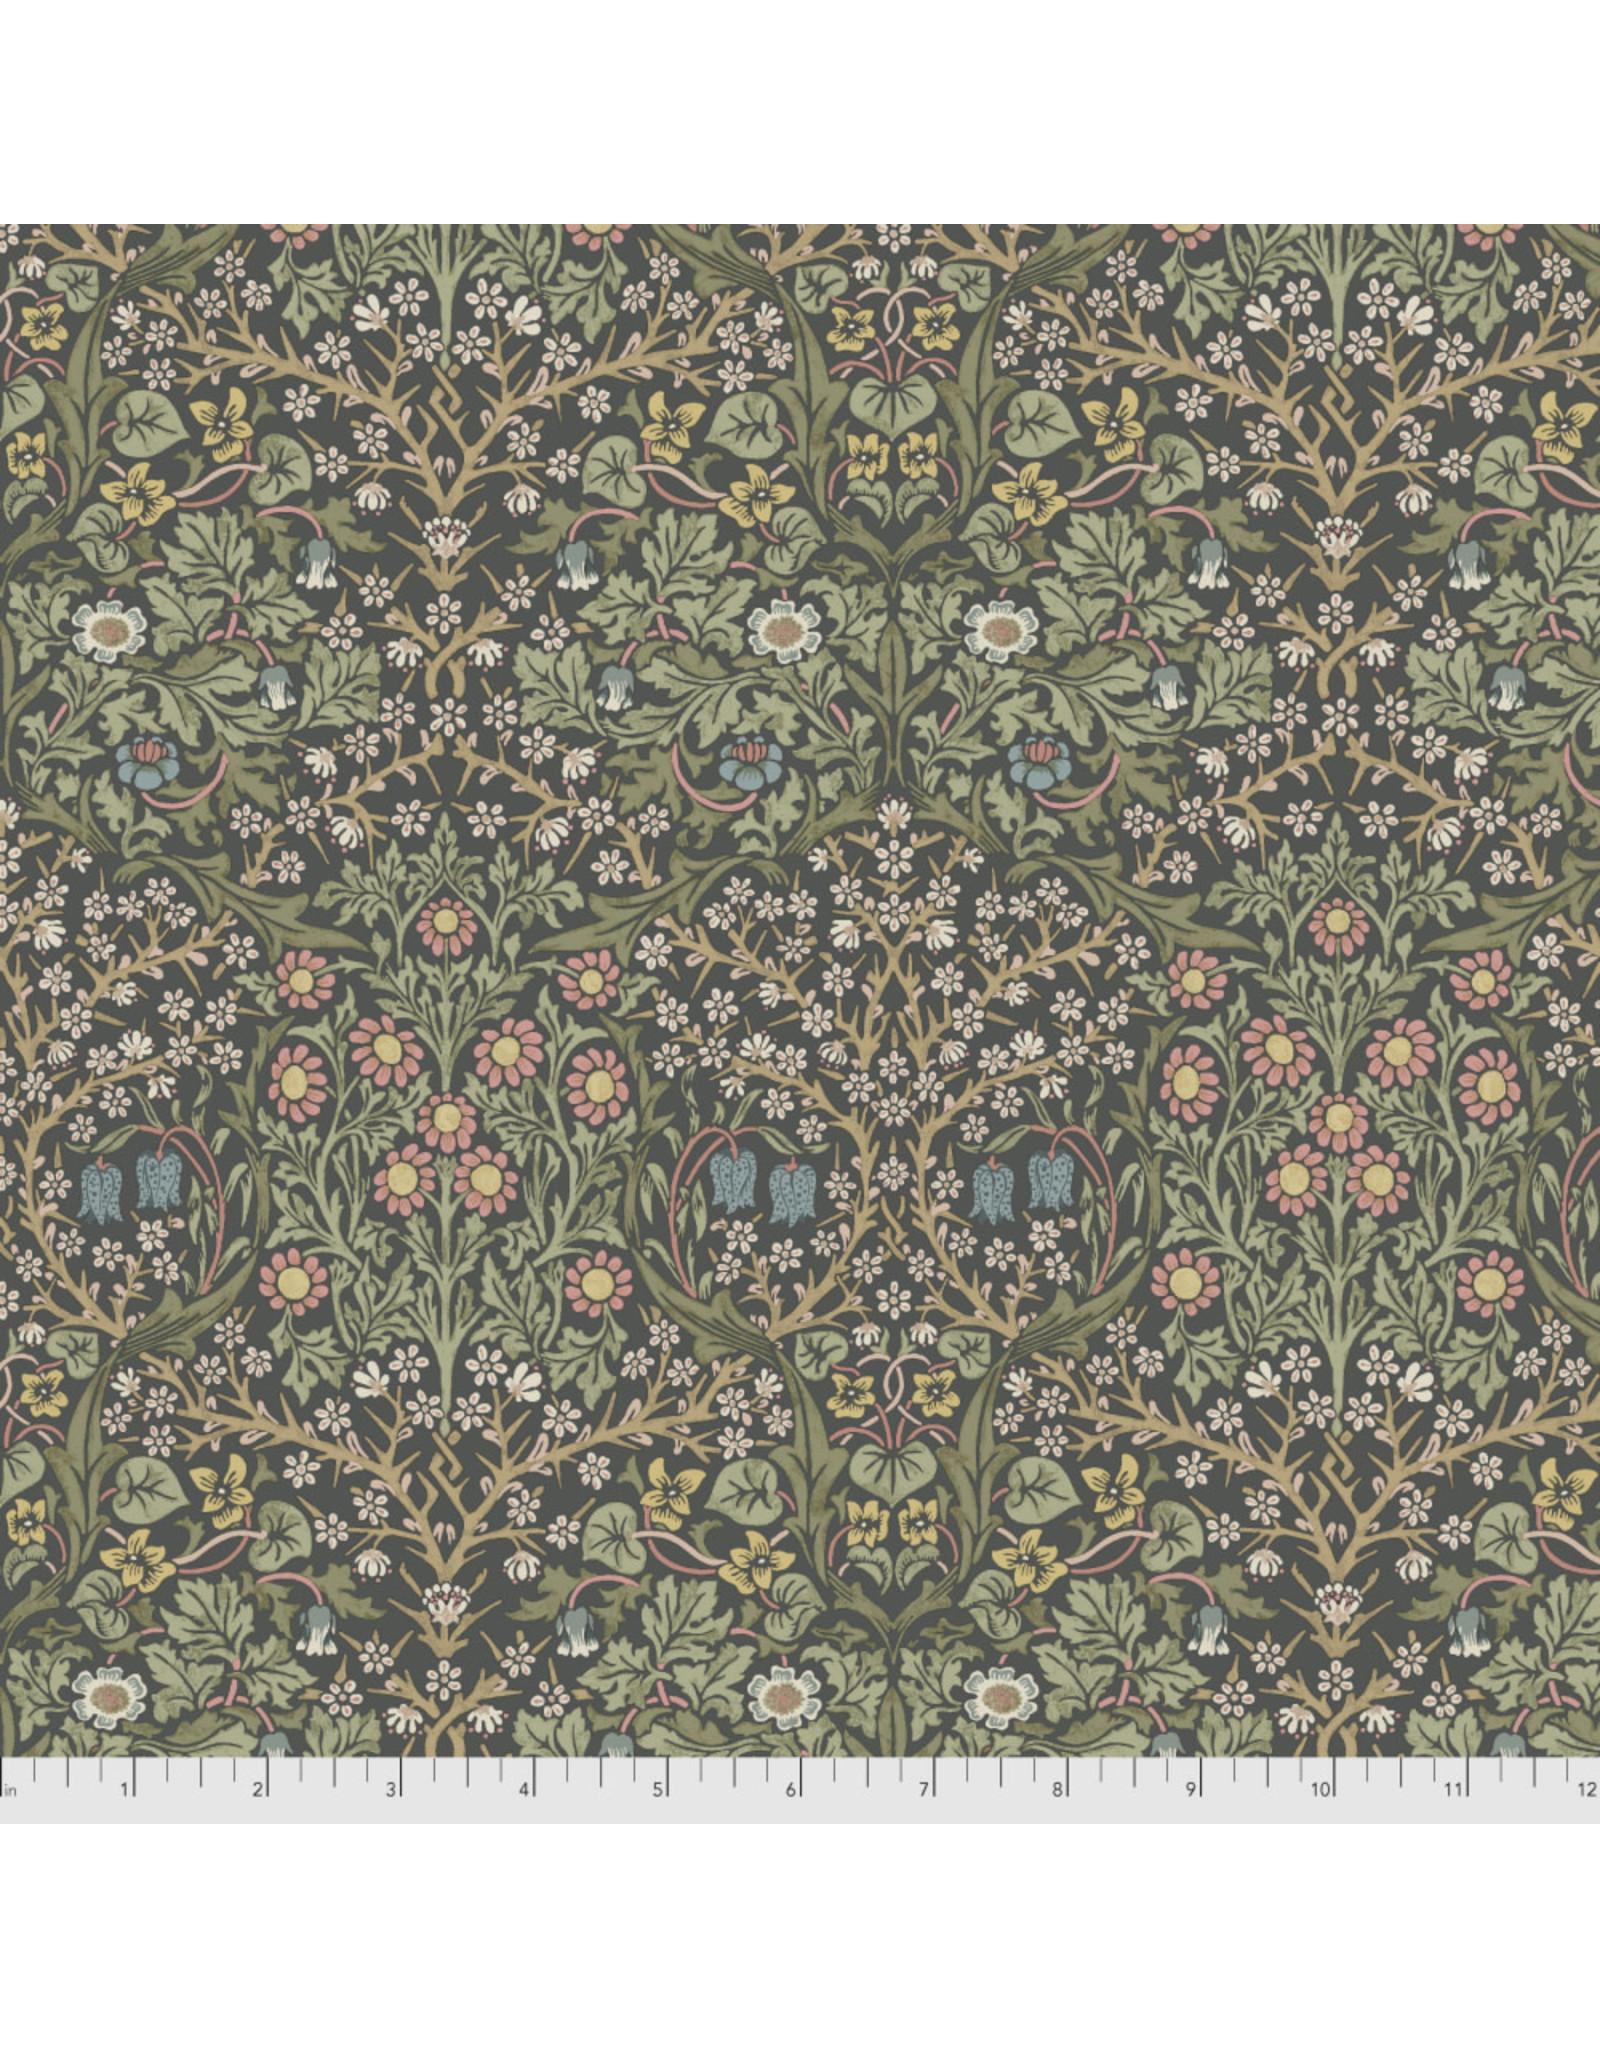 William Morris & Co. Morris & Co., Granada, Blackthorne in Charcoal, Fabric Half-Yards